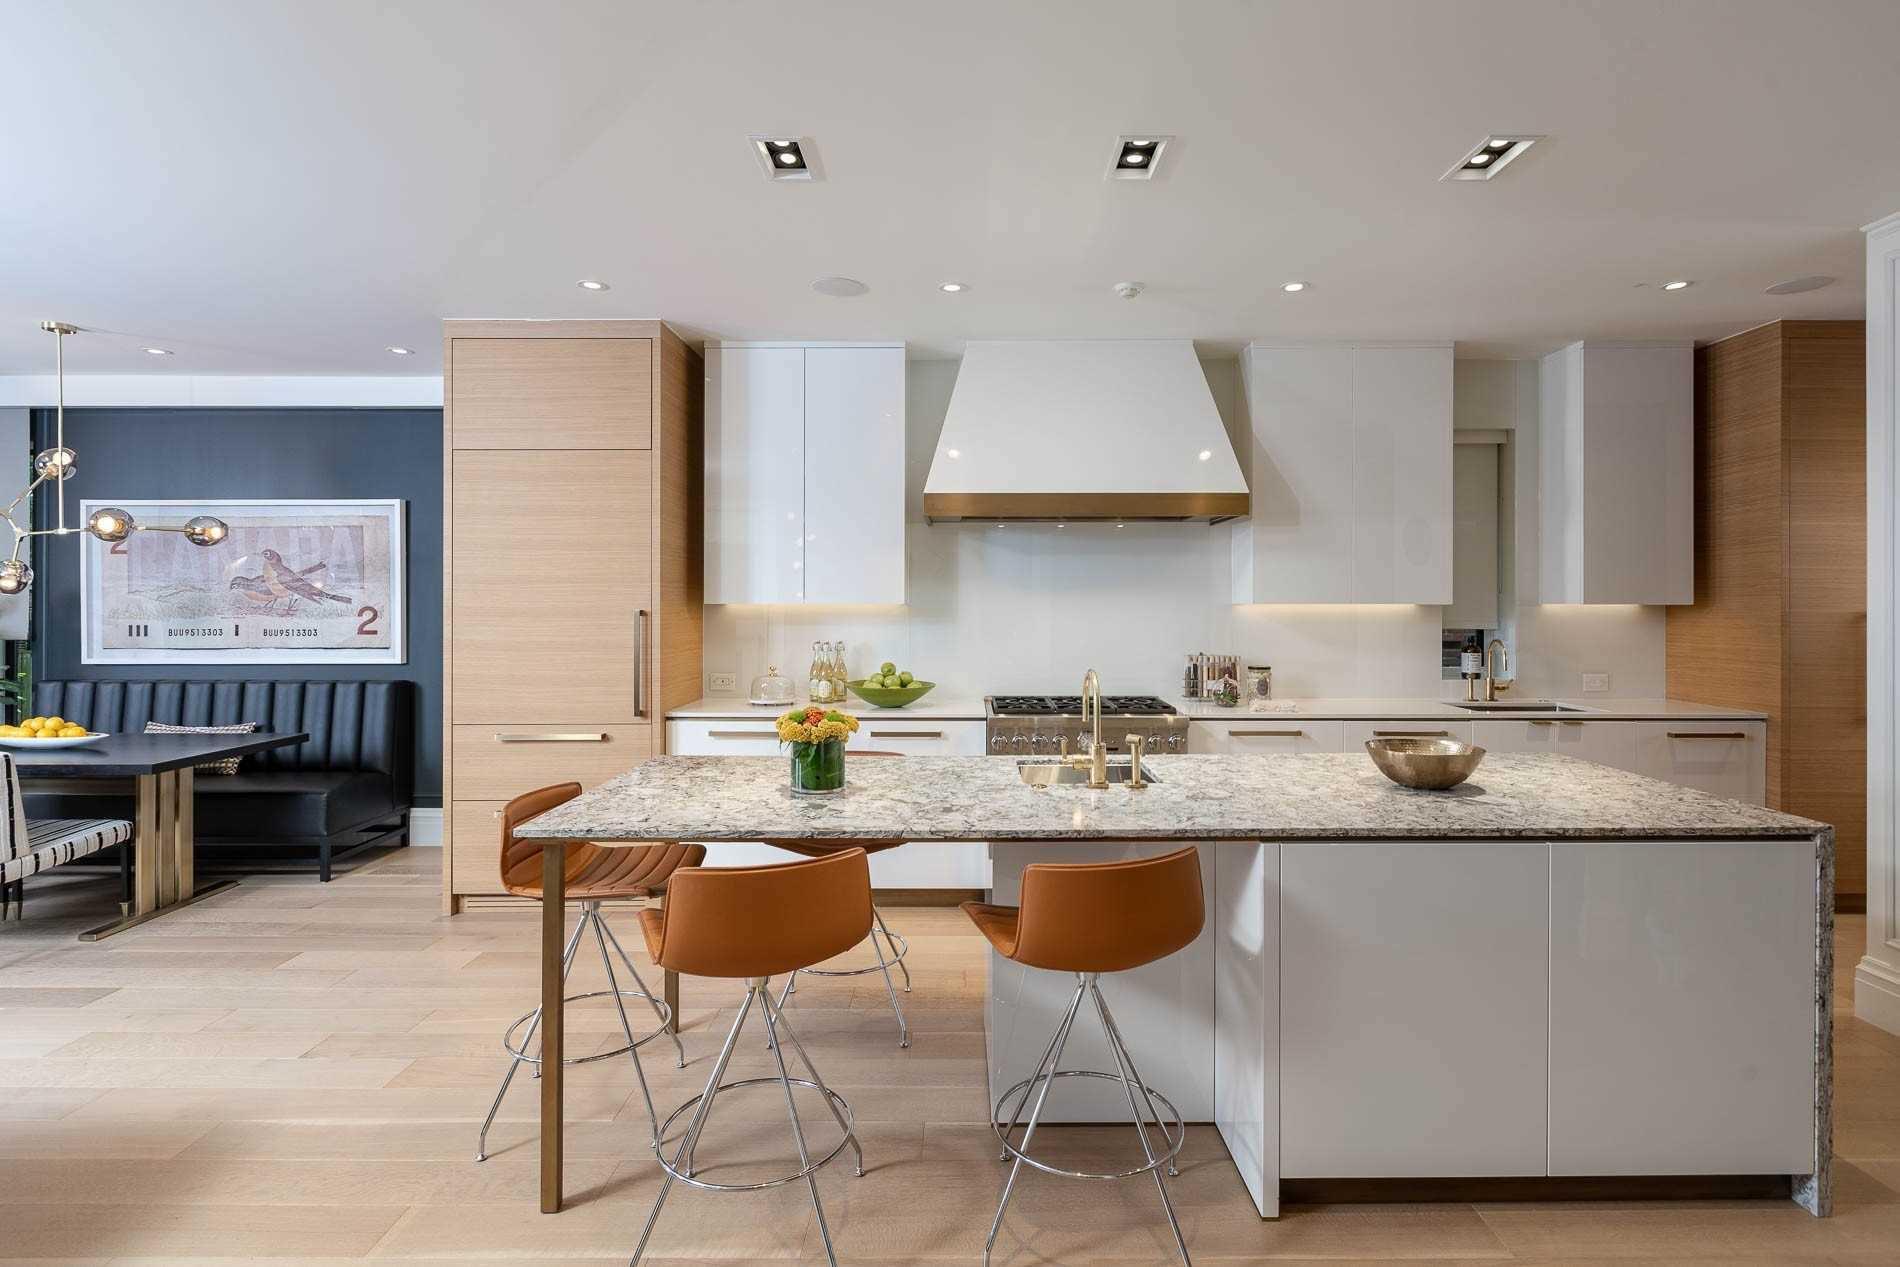 Photo 6: Photos: 45 Admiral Road in Toronto: Annex House (3-Storey) for sale (Toronto C02)  : MLS®# C4612730